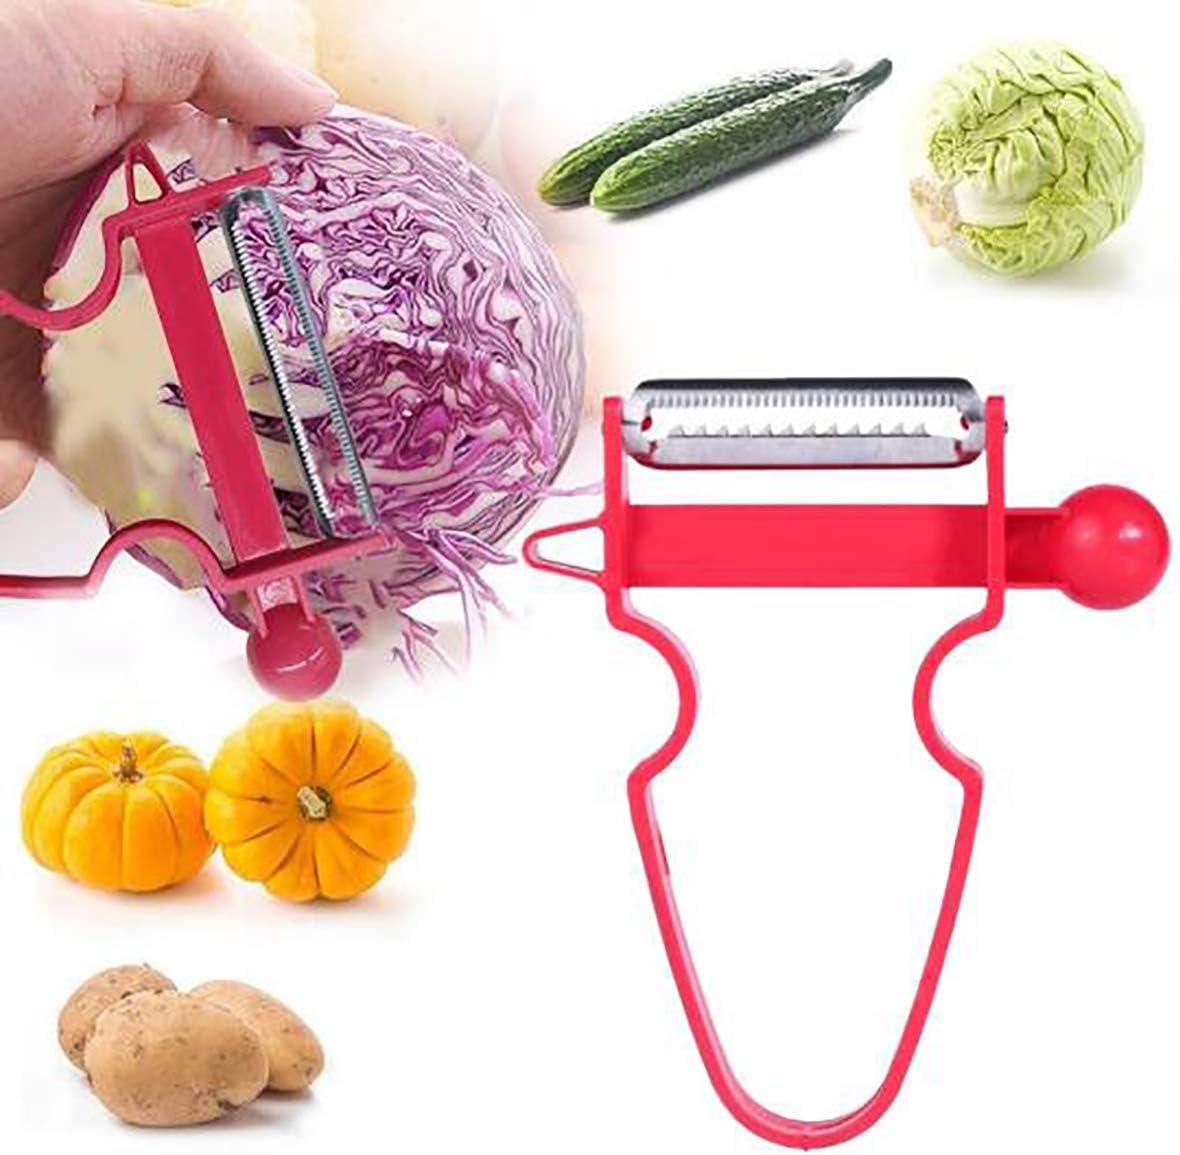 Patatas Cebolla Queso Frutas JUNRONG Magic Trio Peeler Set de 3 peladores de Naranjas universales para Verduras